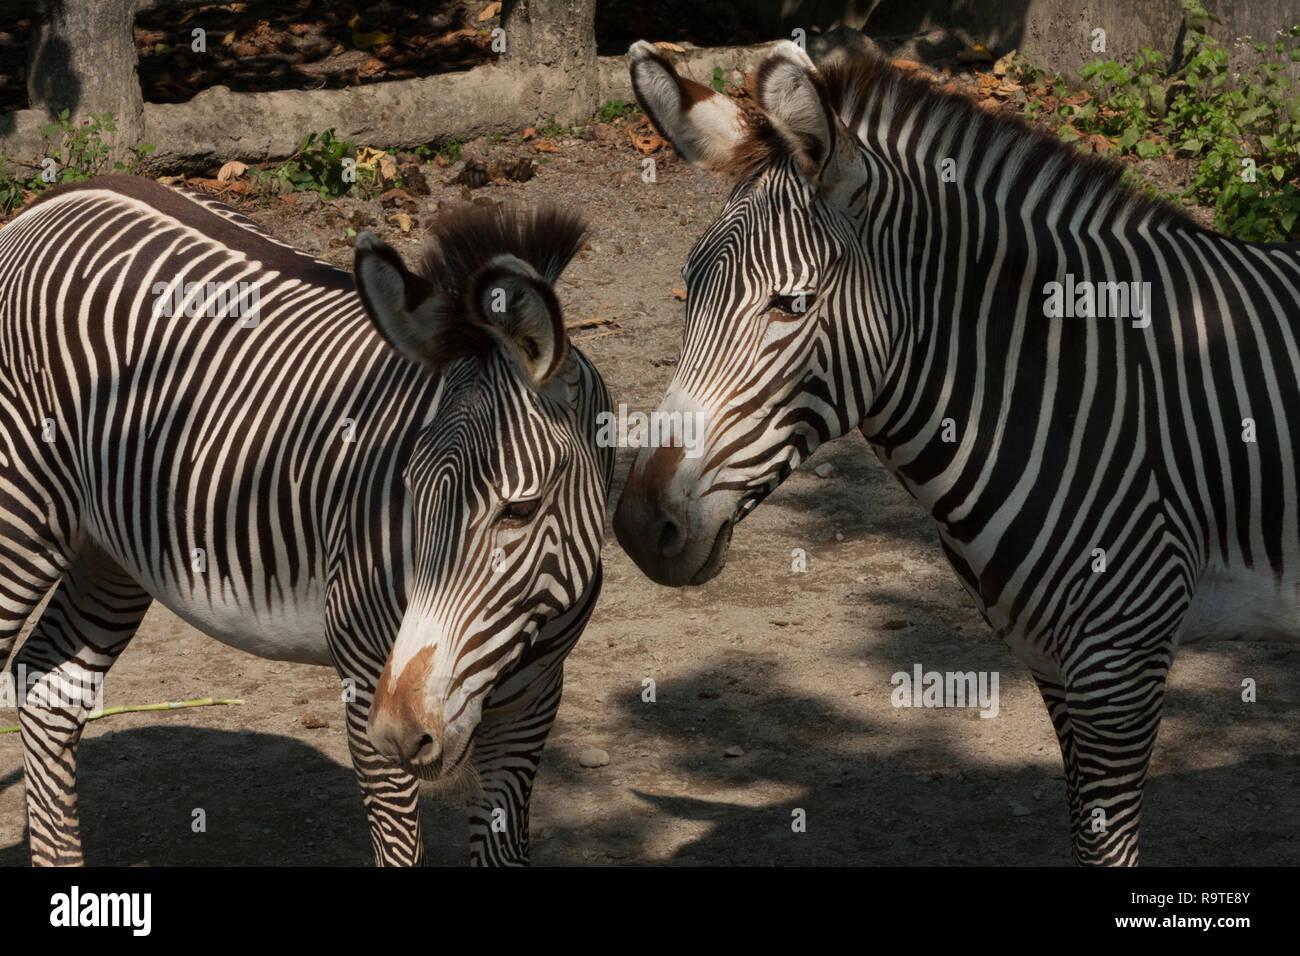 Grevy's zebra (Equus grevyi), aka imperial zebra, adult and young zebra, Taipei Zoo a.k.a. Muzha Zoo, Taipei City, Taiwan Stock Photo